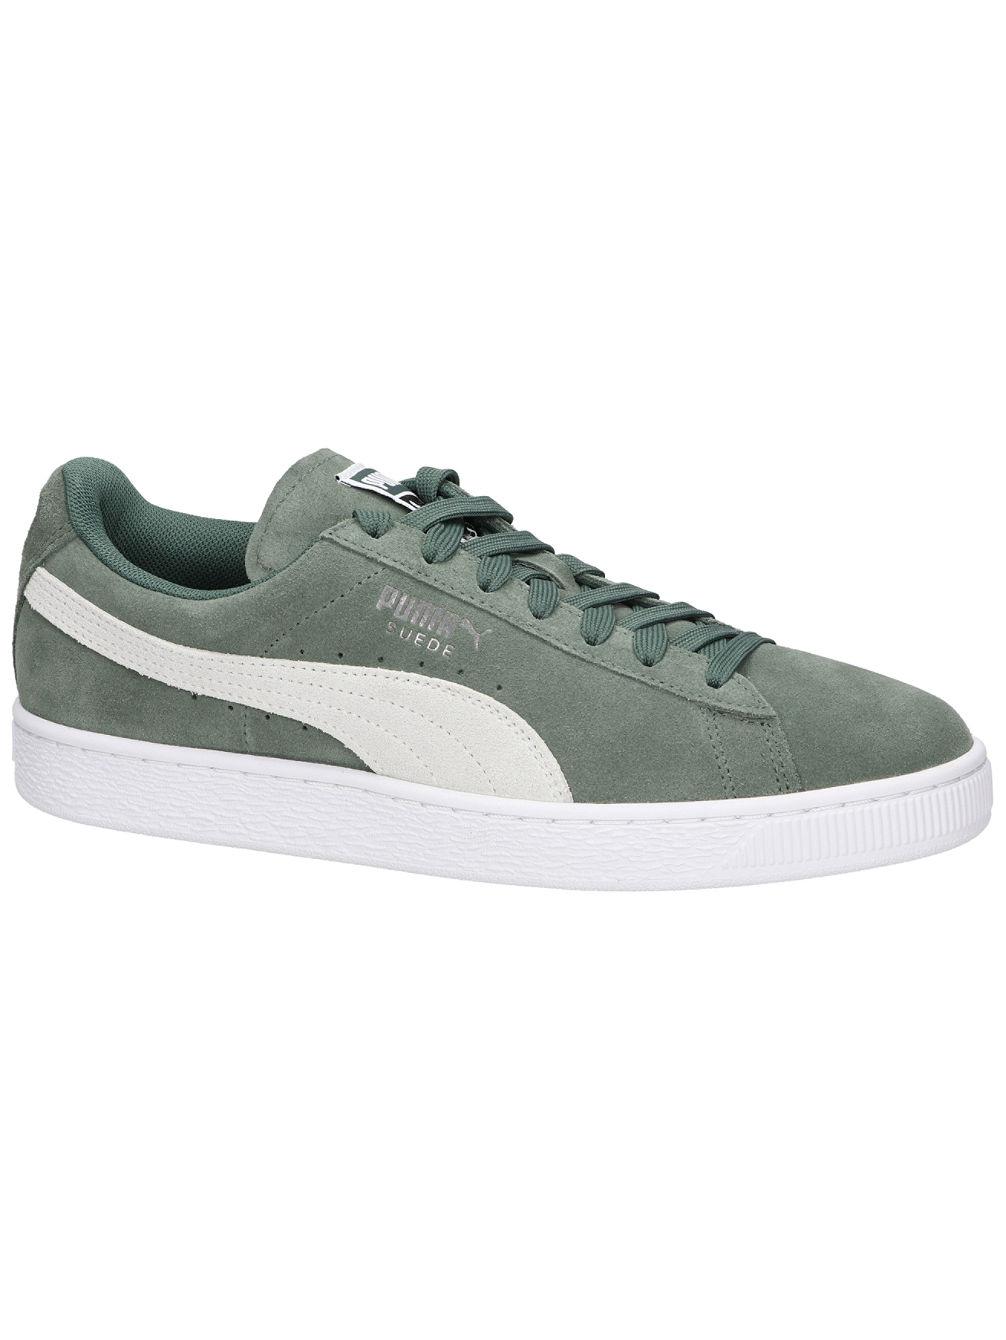 quality design b6e46 4fcc5 Suede Classic Sneakers